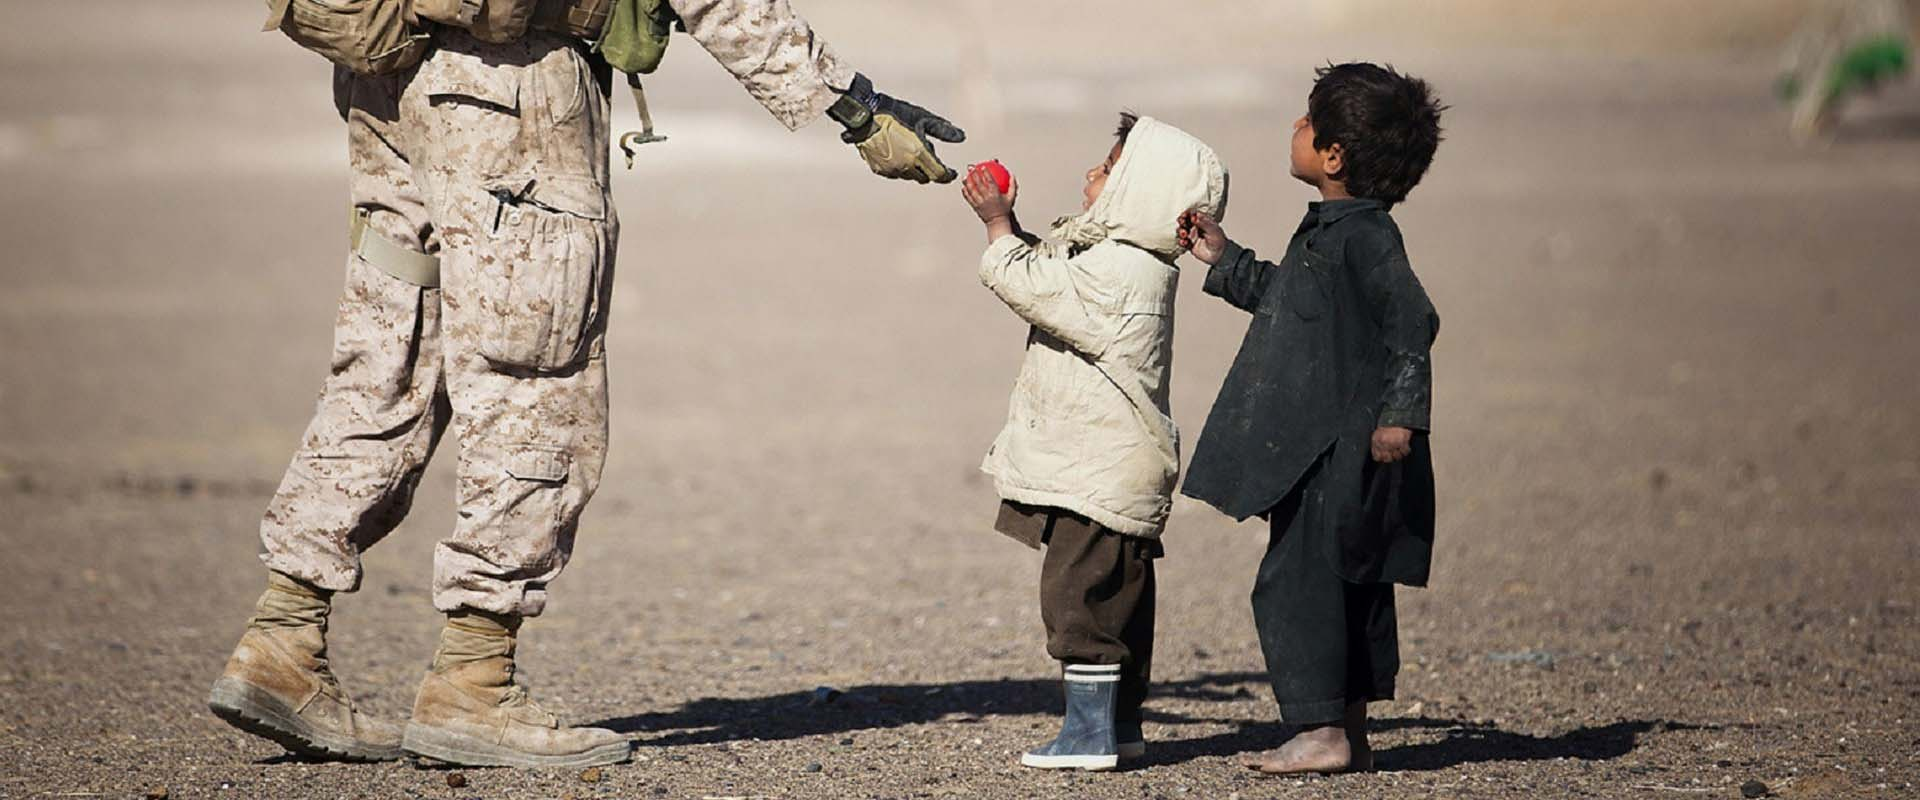 Ahmed in Iraq